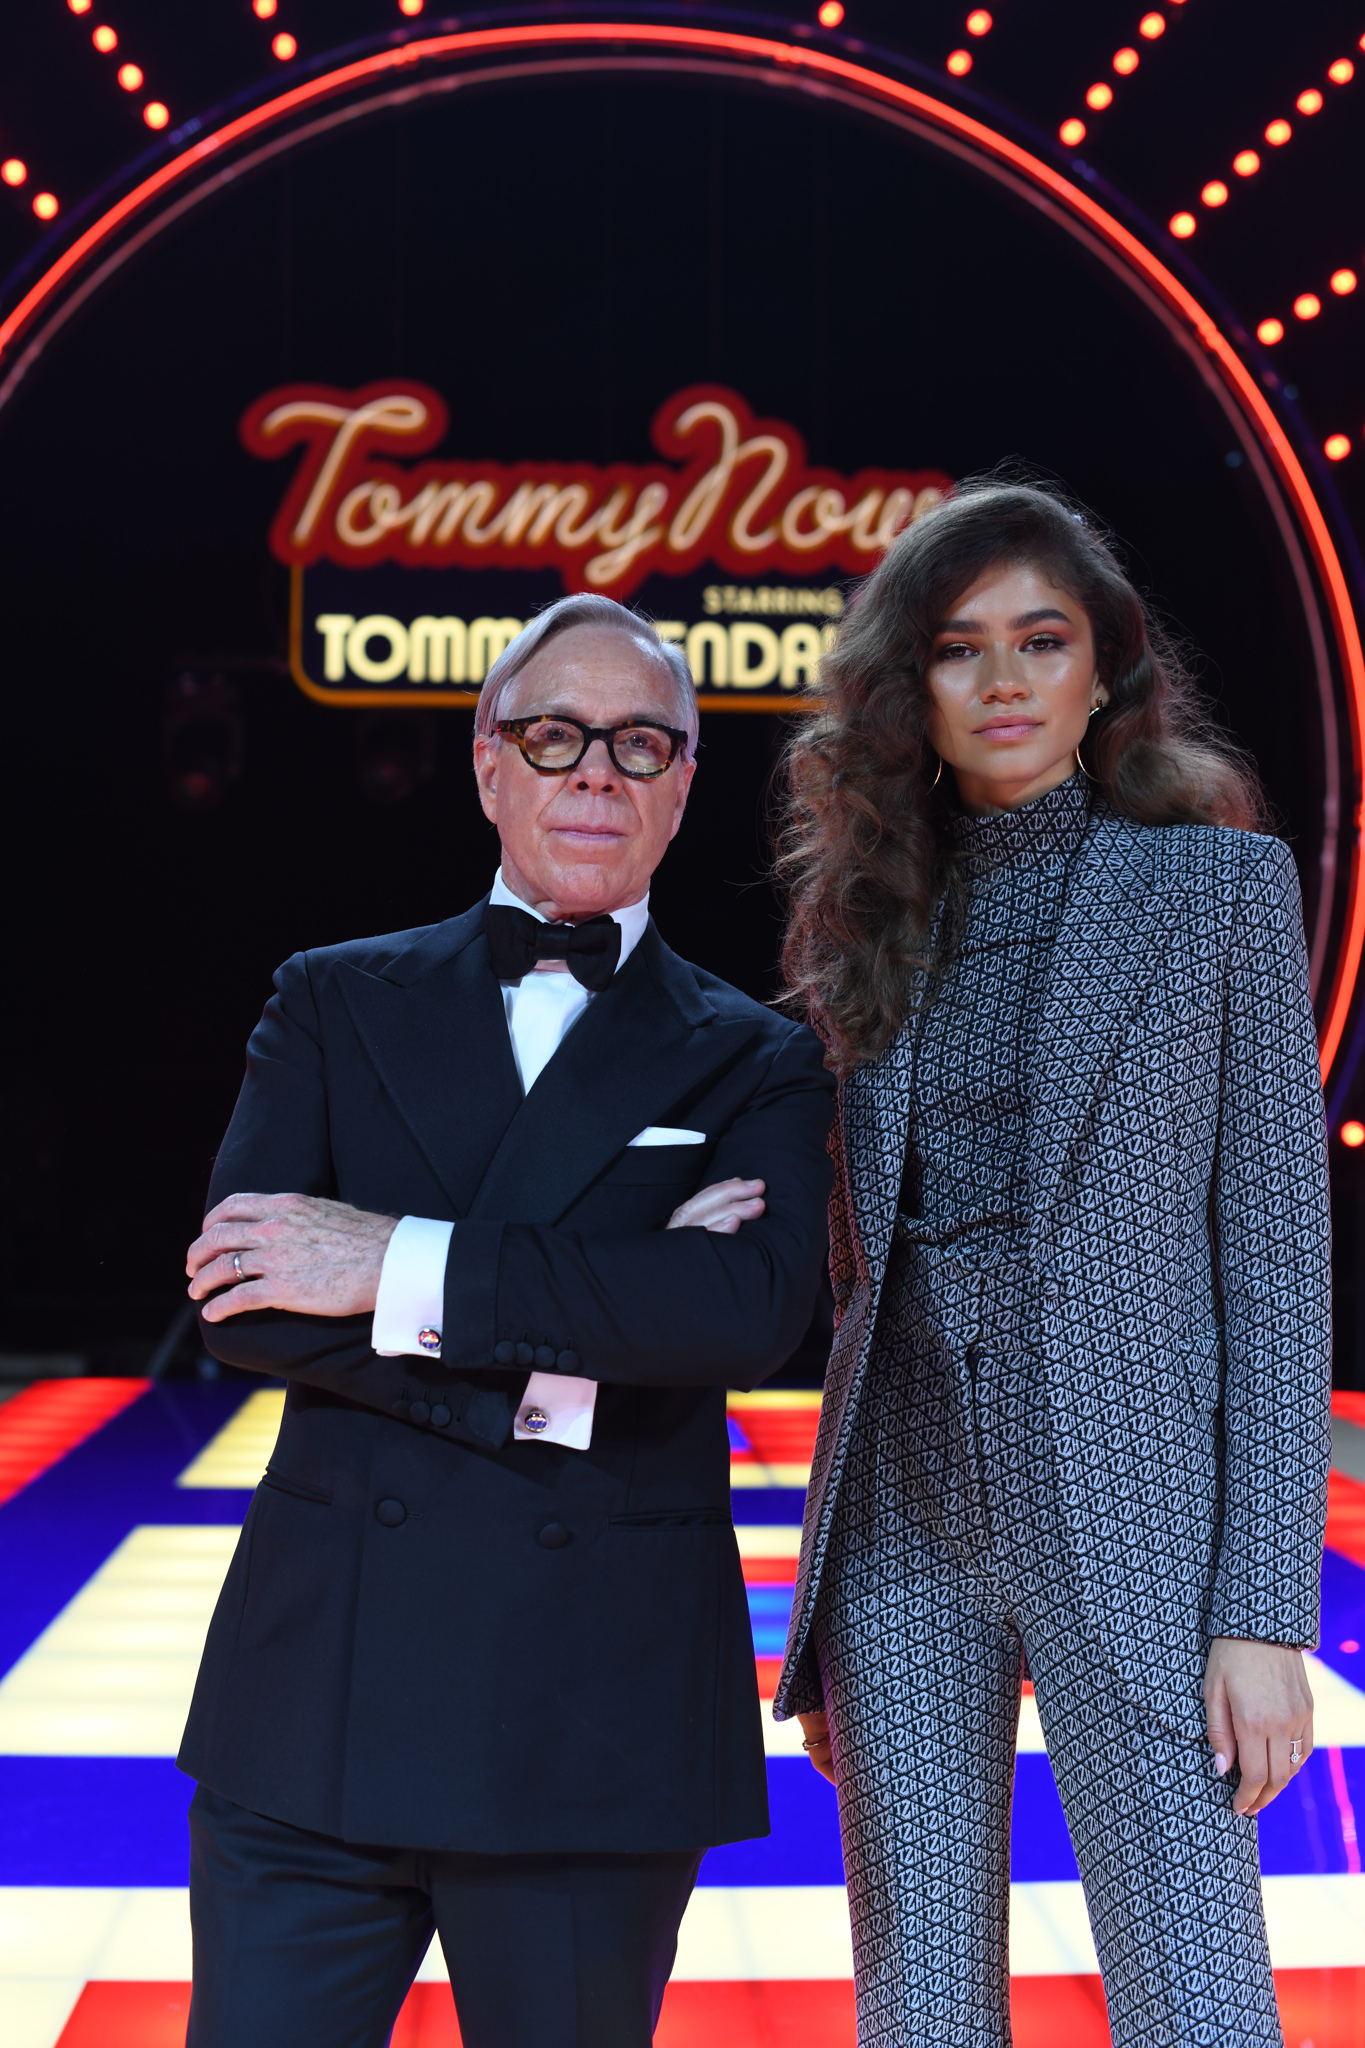 Tommy Hilfiger and Zendaya Coleman